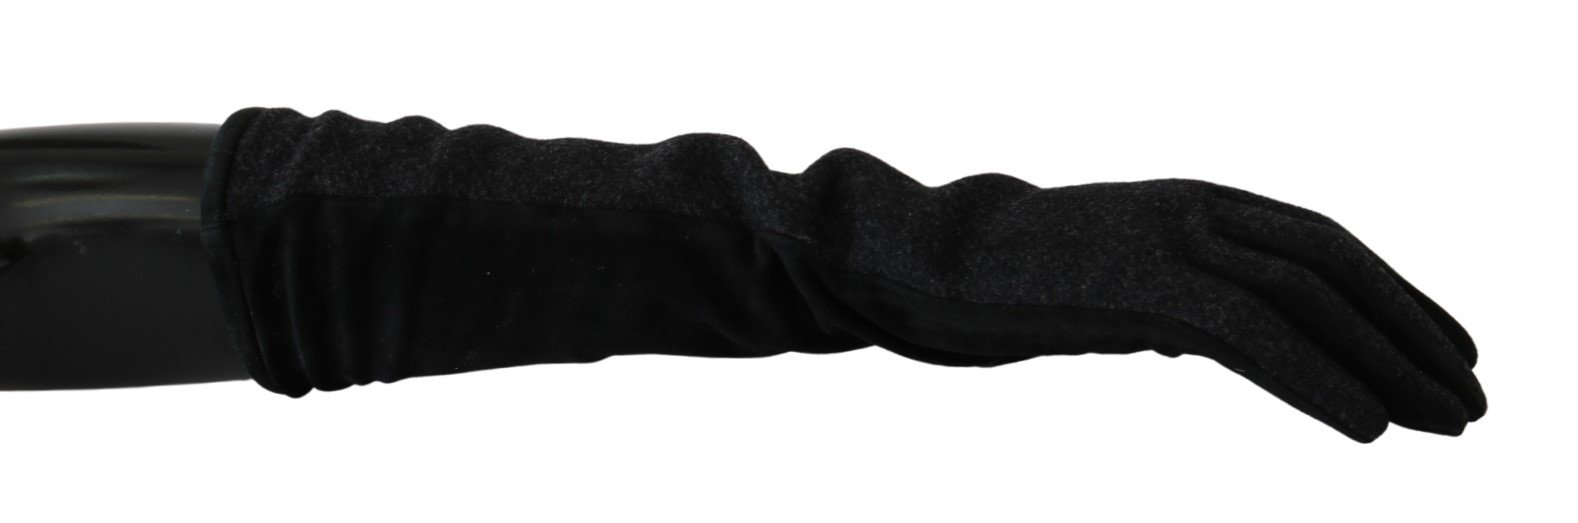 Dolce & Gabbana Women's Mid Arm Length Mittens Gloves Black LB1021 - 7.5 S